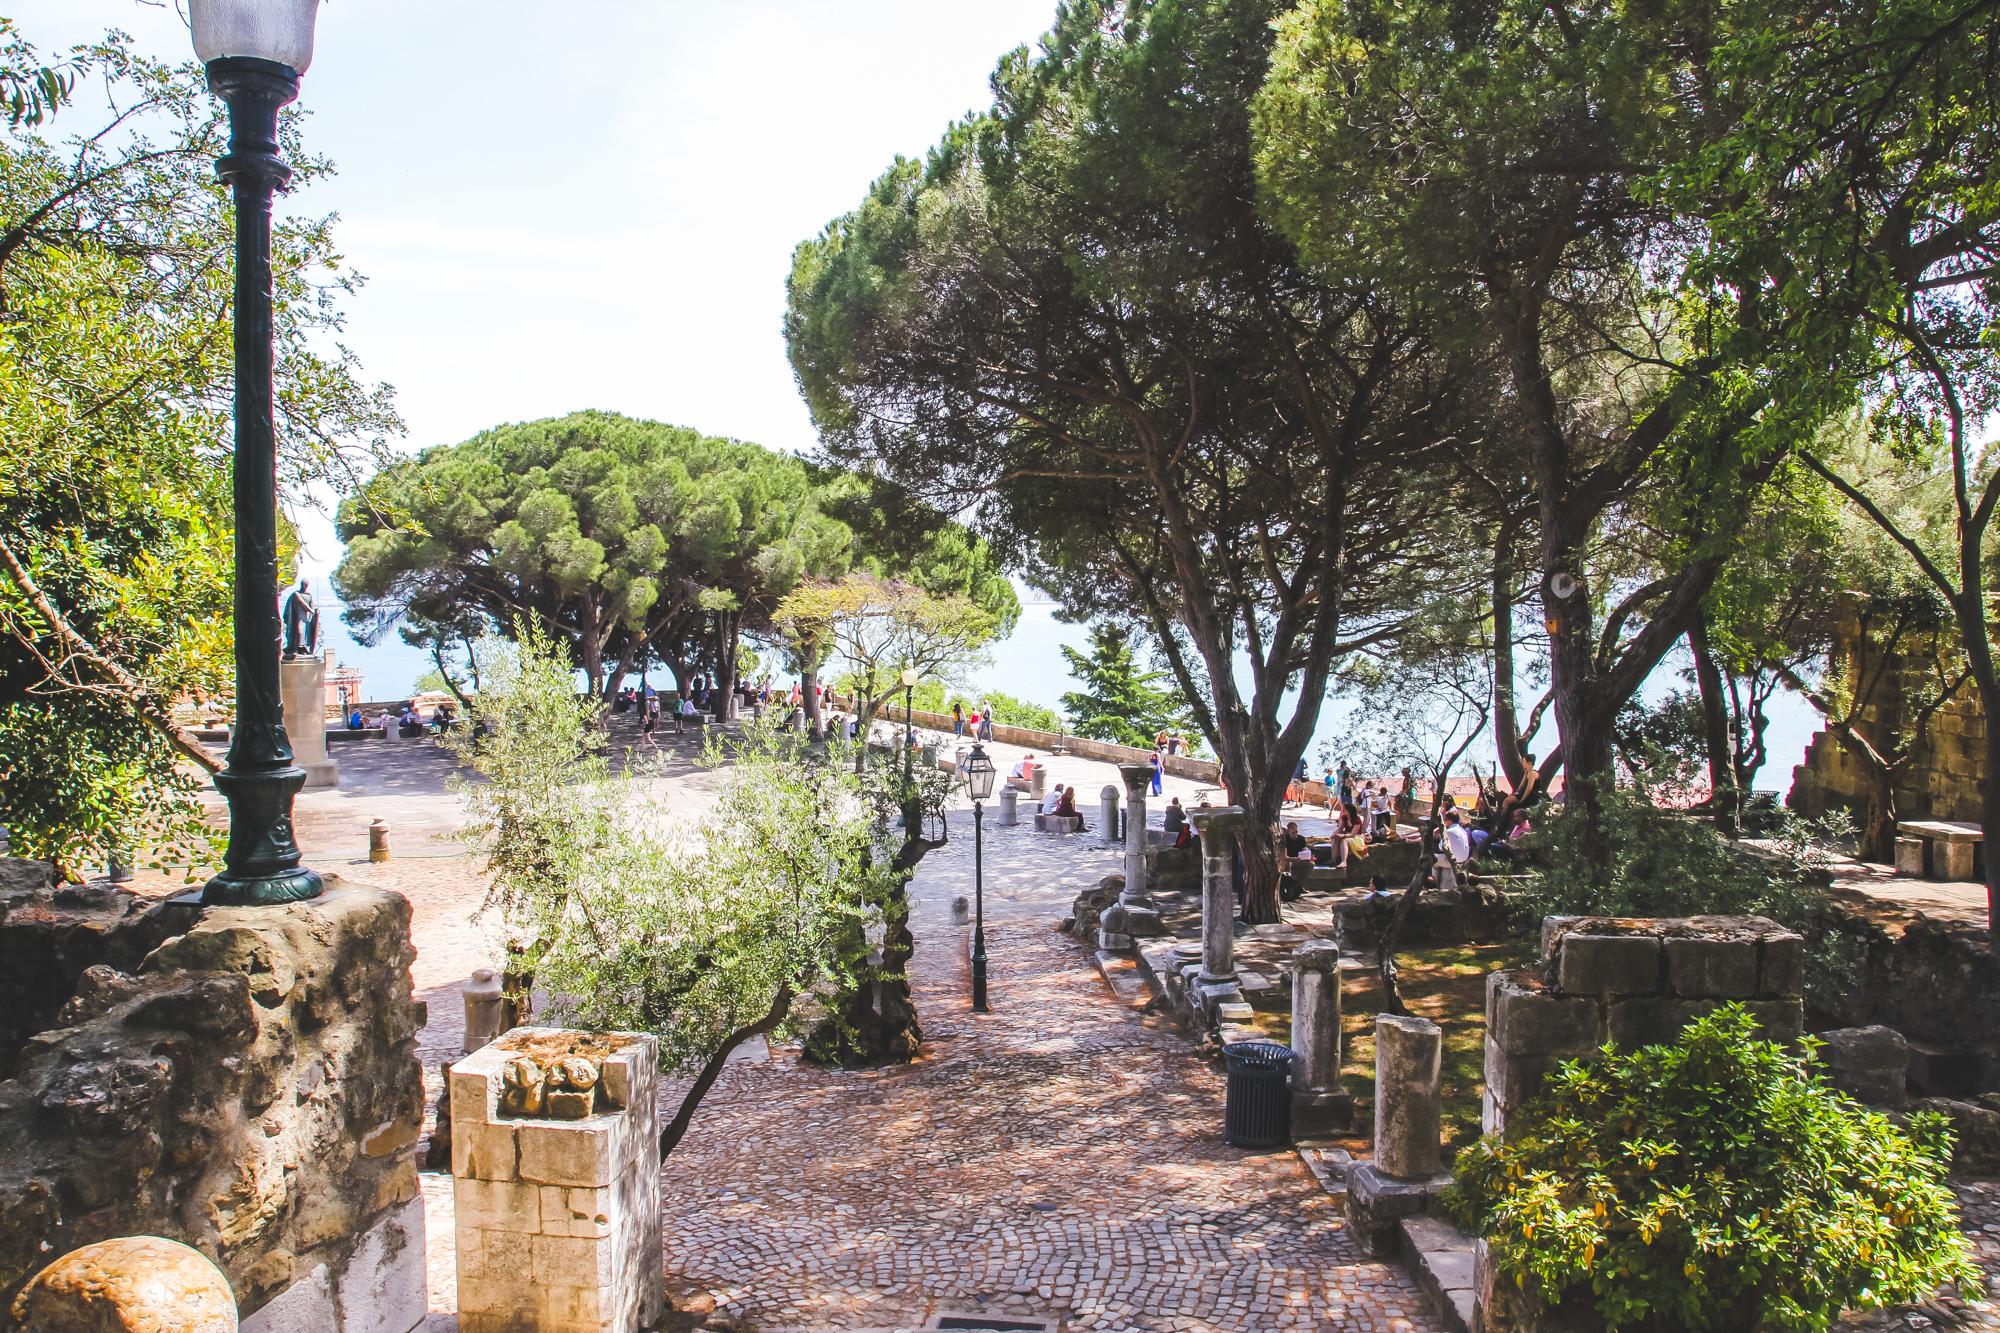 visiter Lisbonne : alfama, chatea Sao Jorgé et Baixa city guide